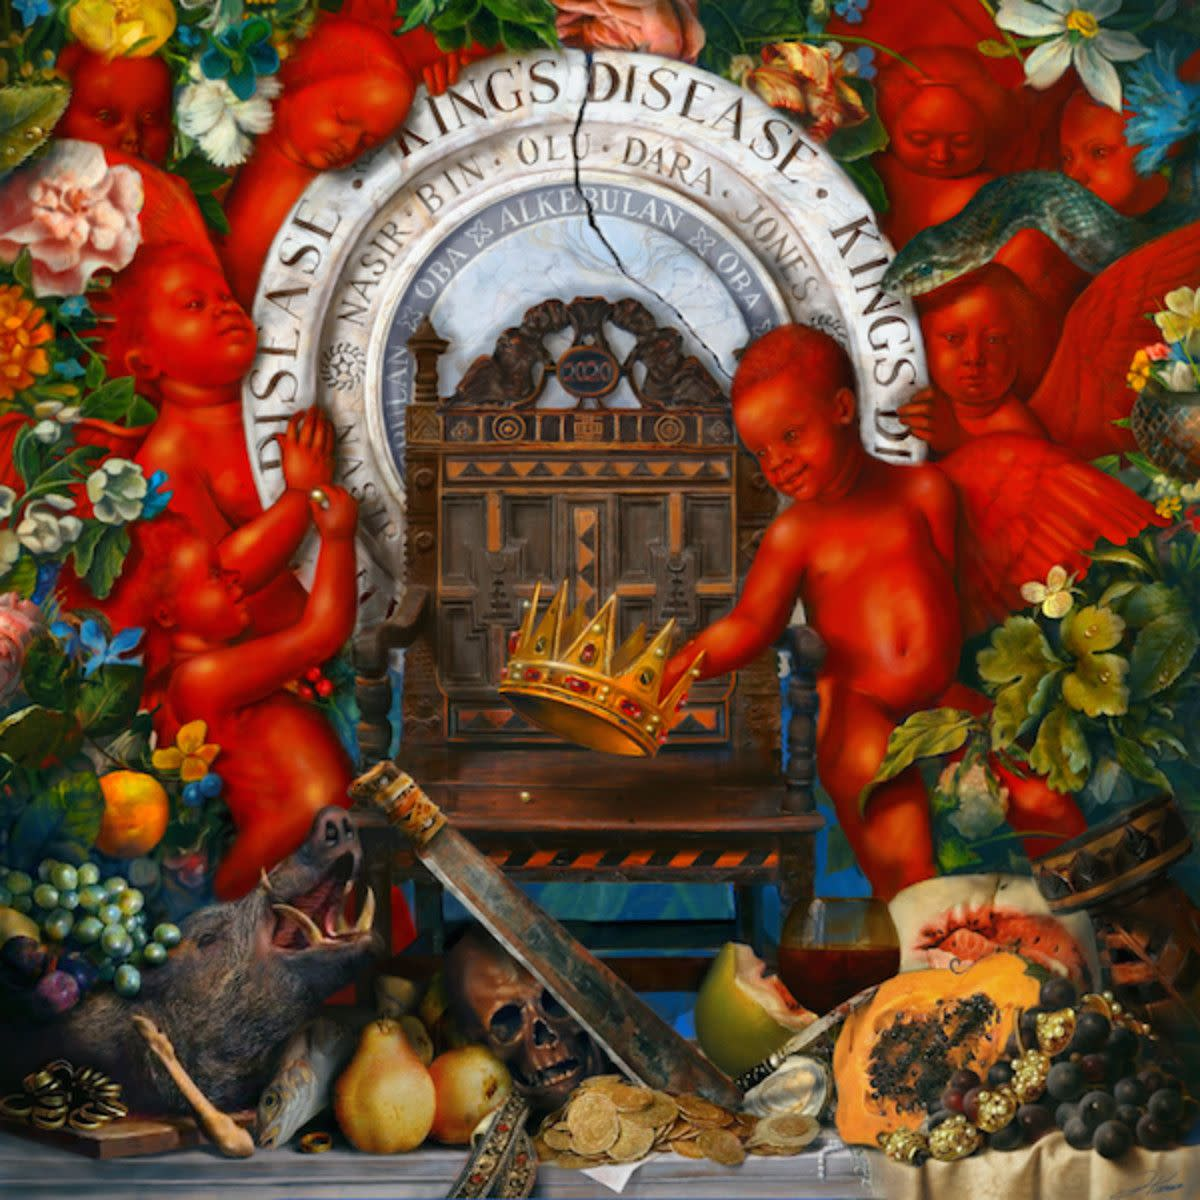 ''King's Disease'' album cover